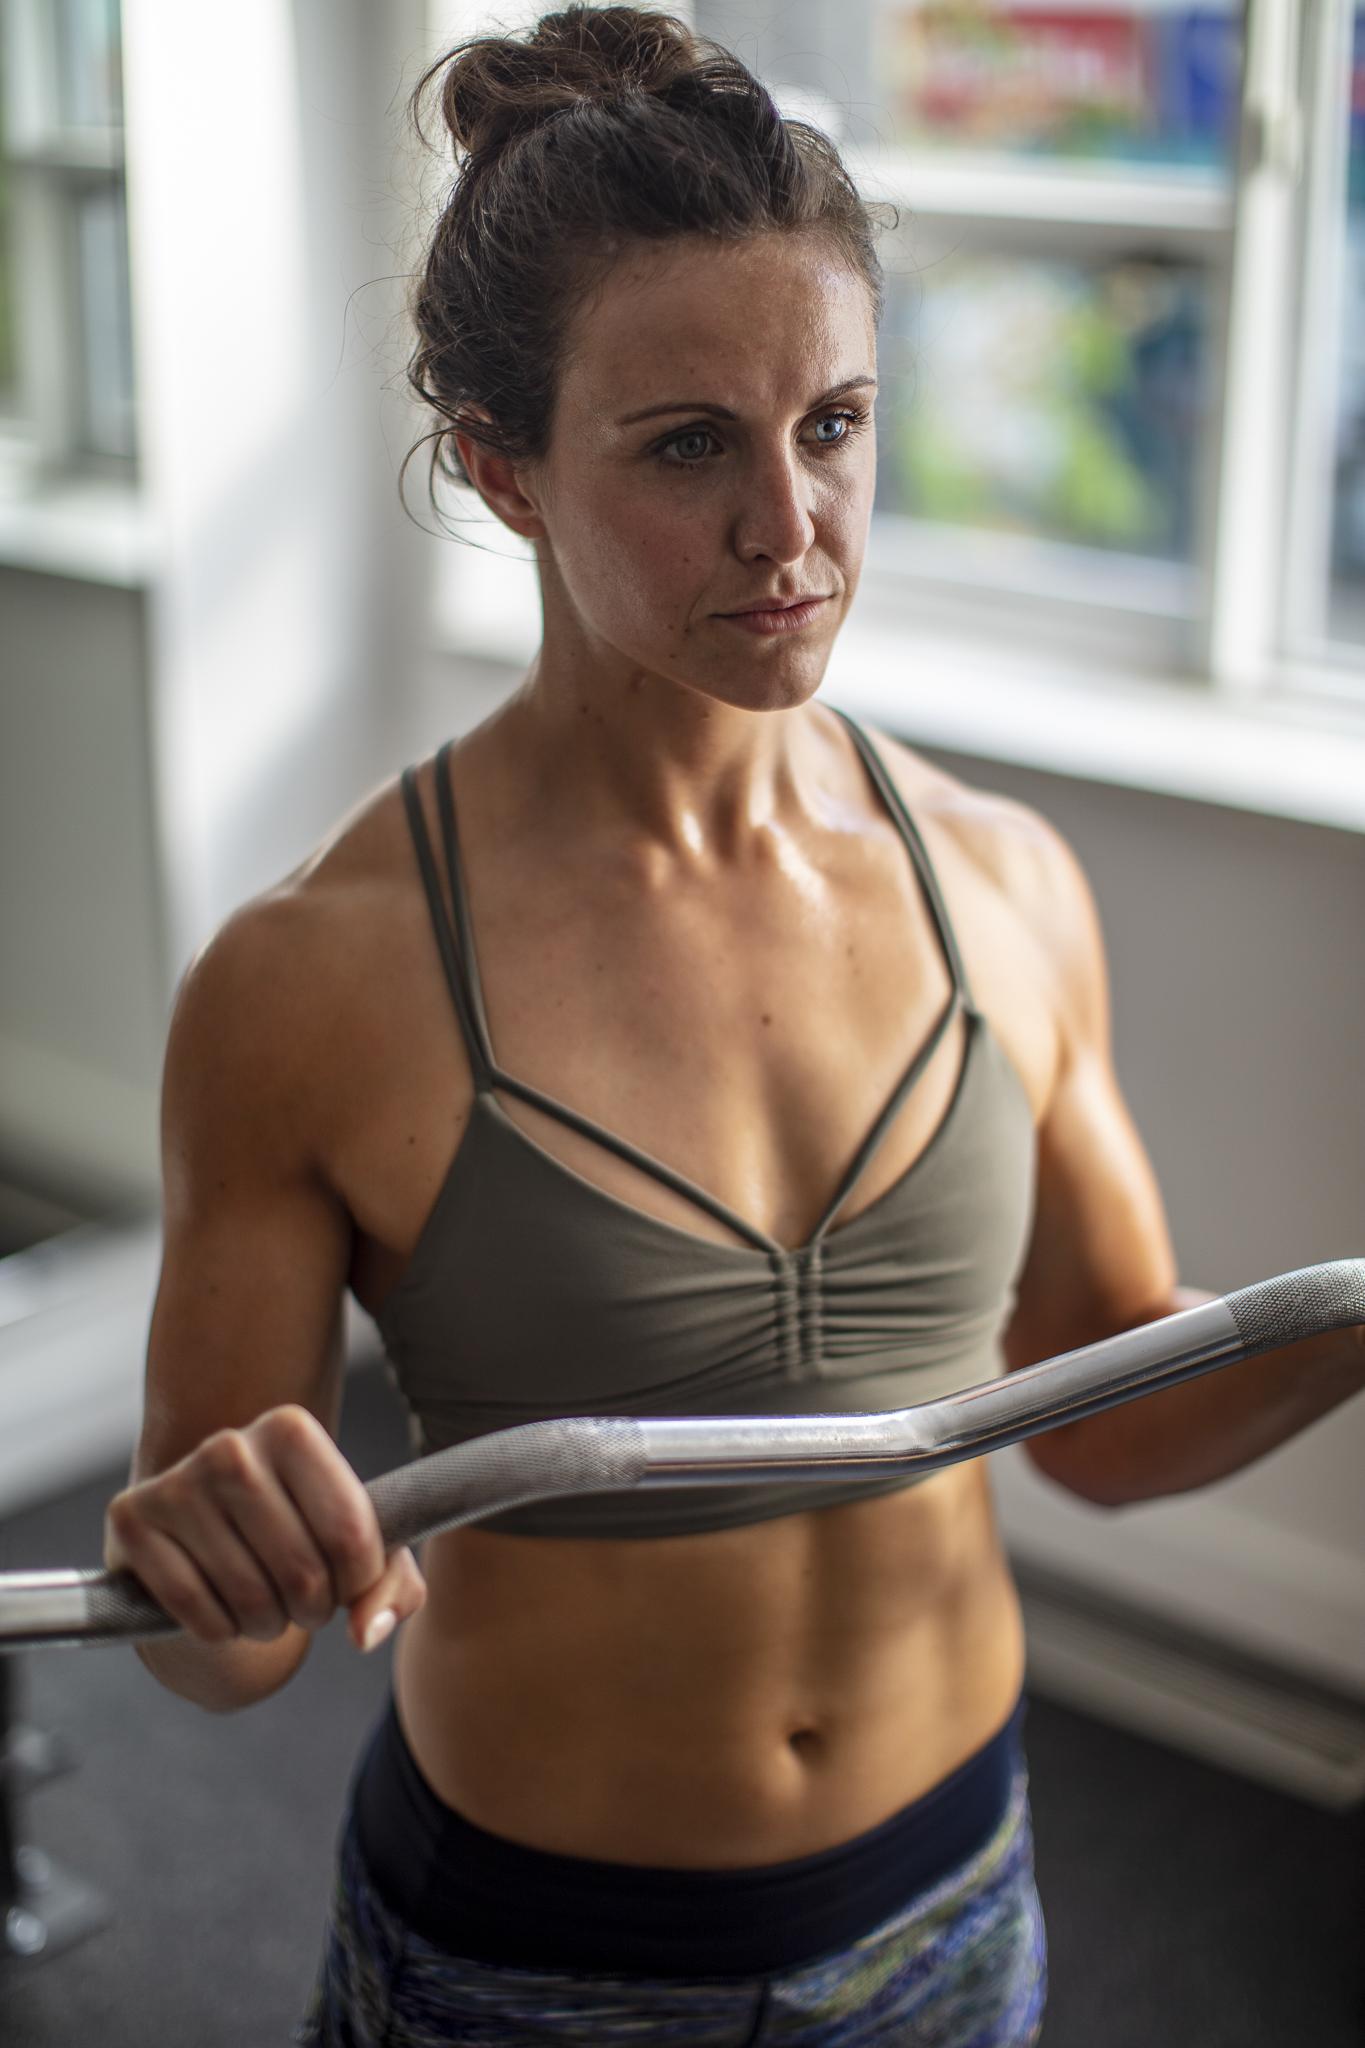 Sara Boyd - Fitness Coach - UvU Fitness - Reduced Edits - 09 Jun '19 - 10.JPG